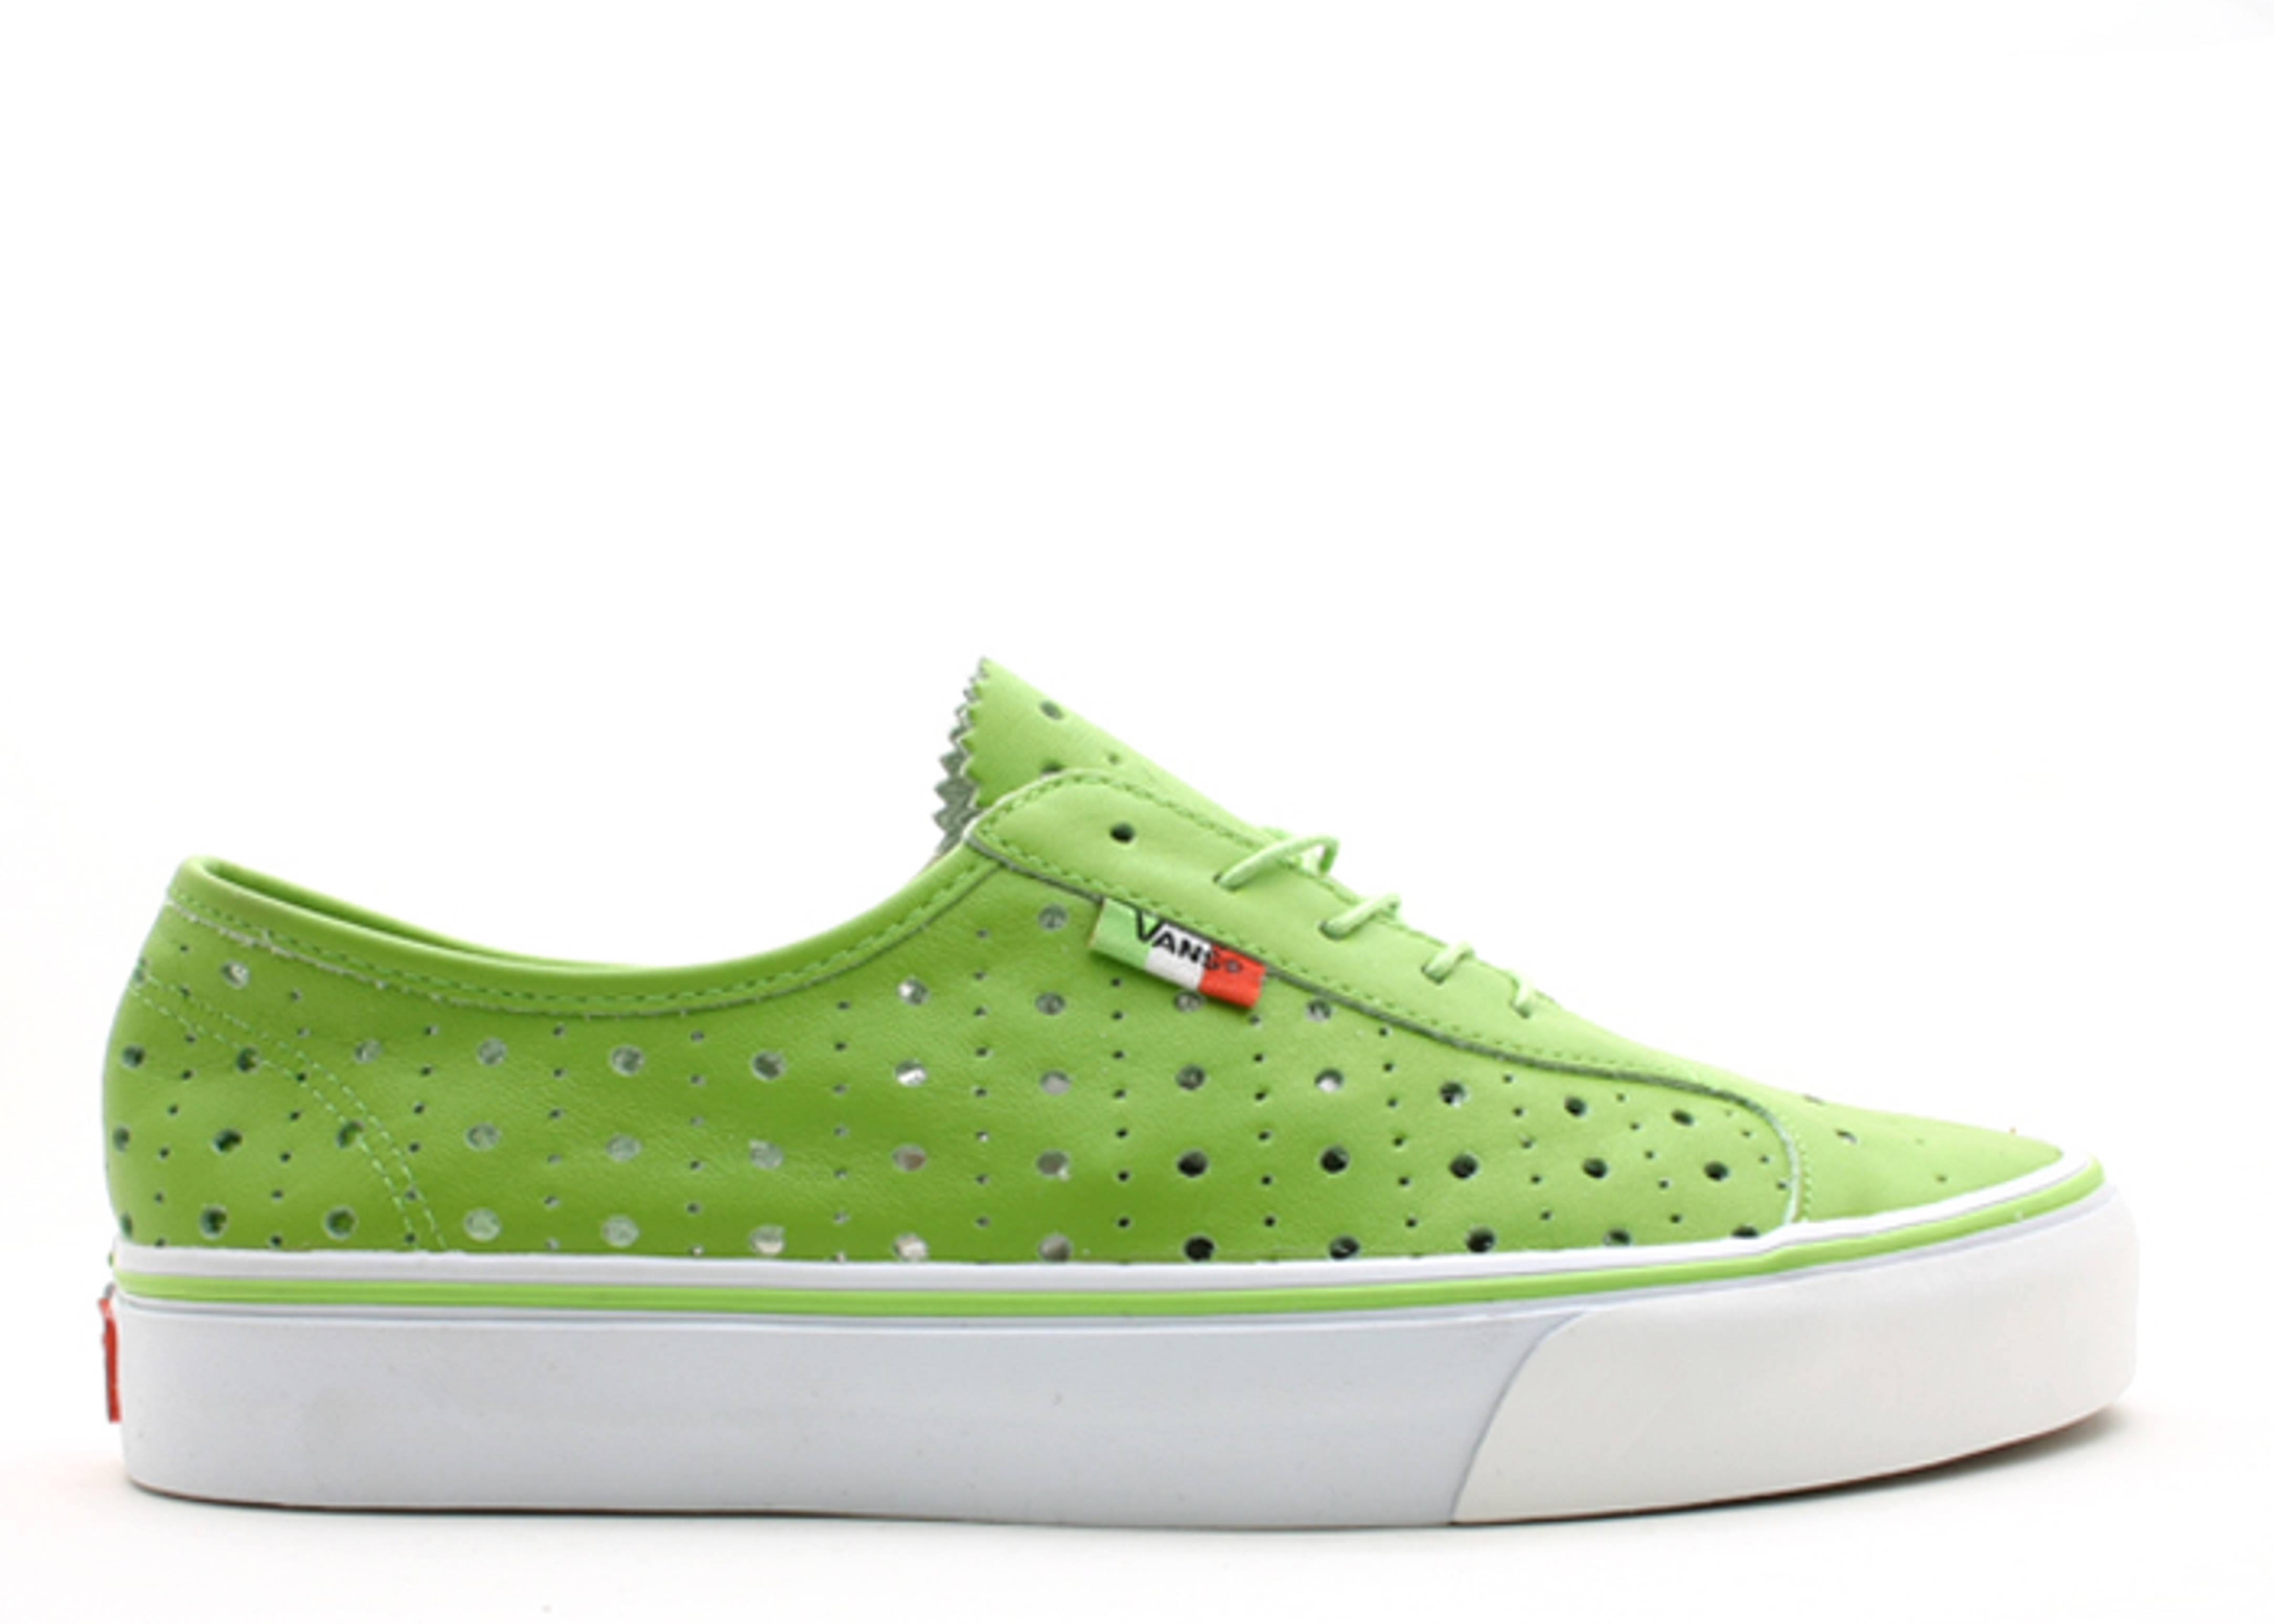 d0e03836a01f Supercorsa - Vans - vn0hi03nks9 - jasmine green